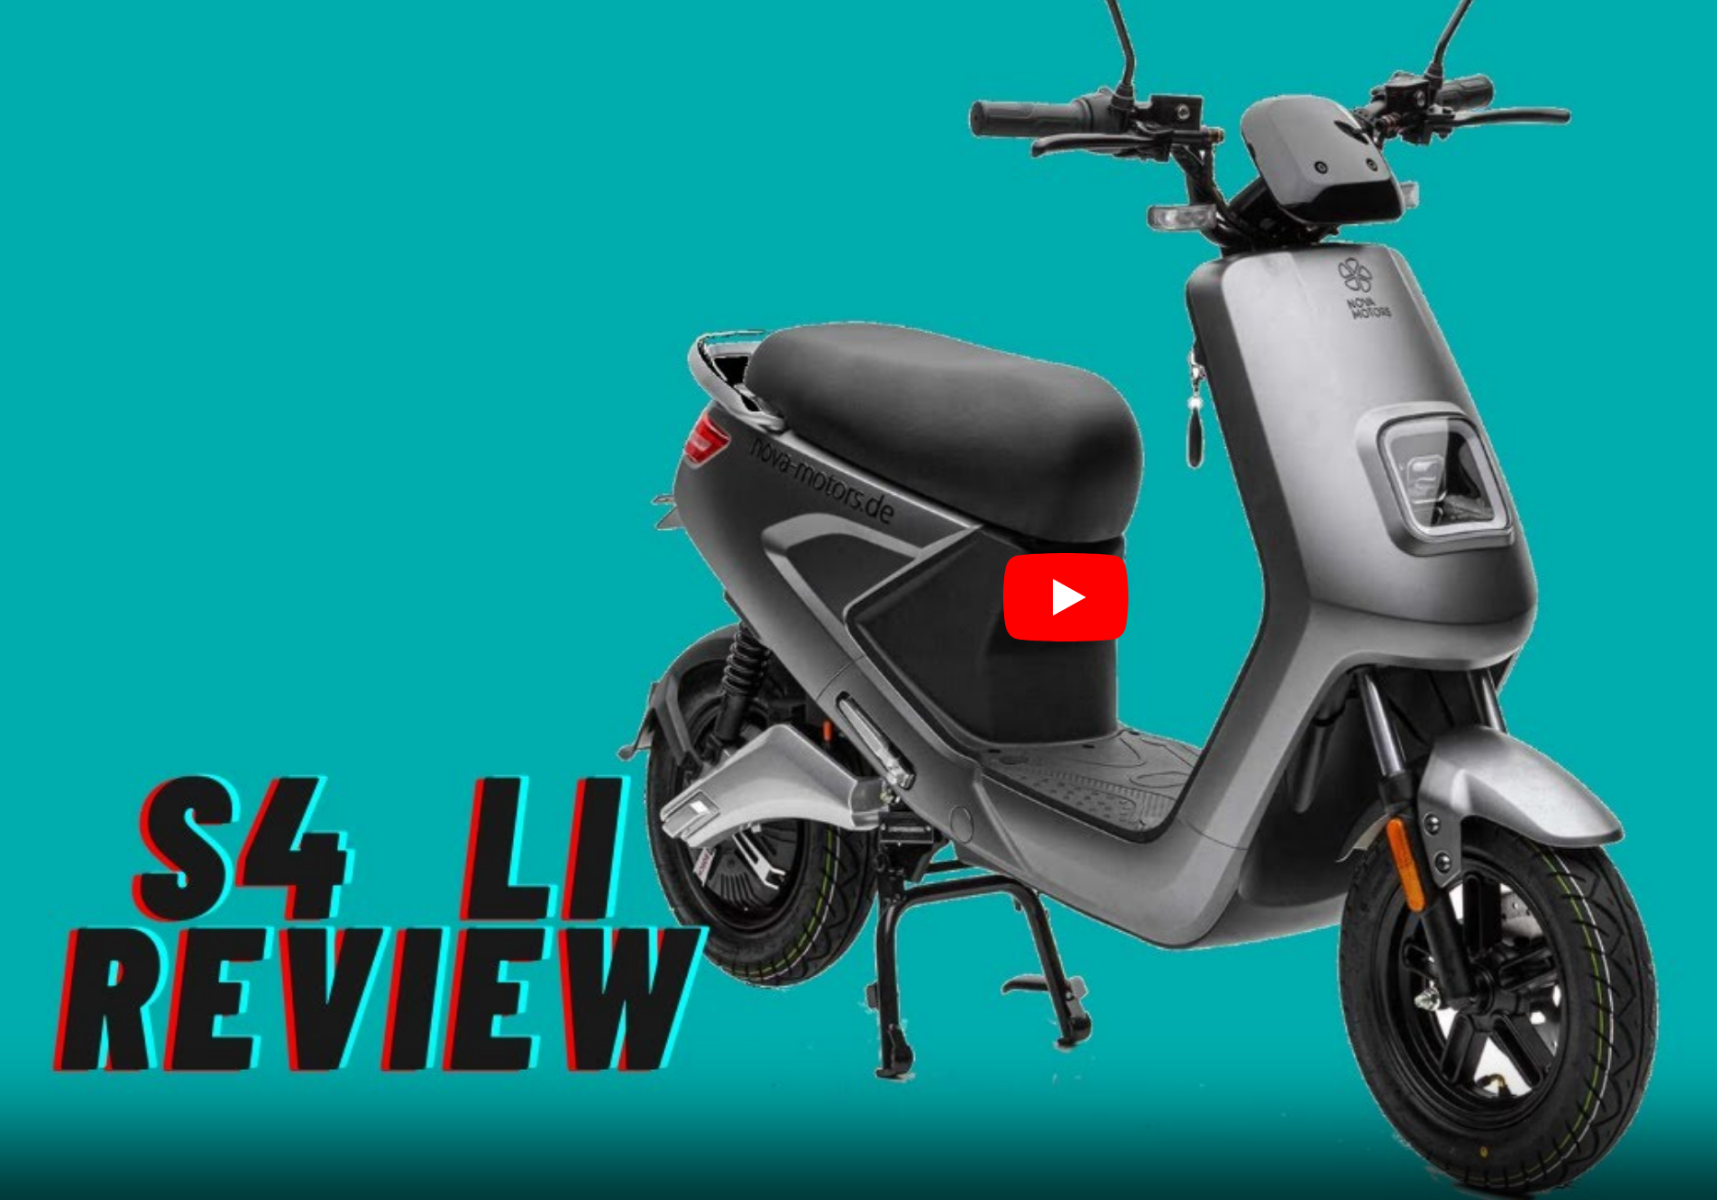 Erfahrungsbericht über den Elektroroller Nova Motors S4 li - Testbericht